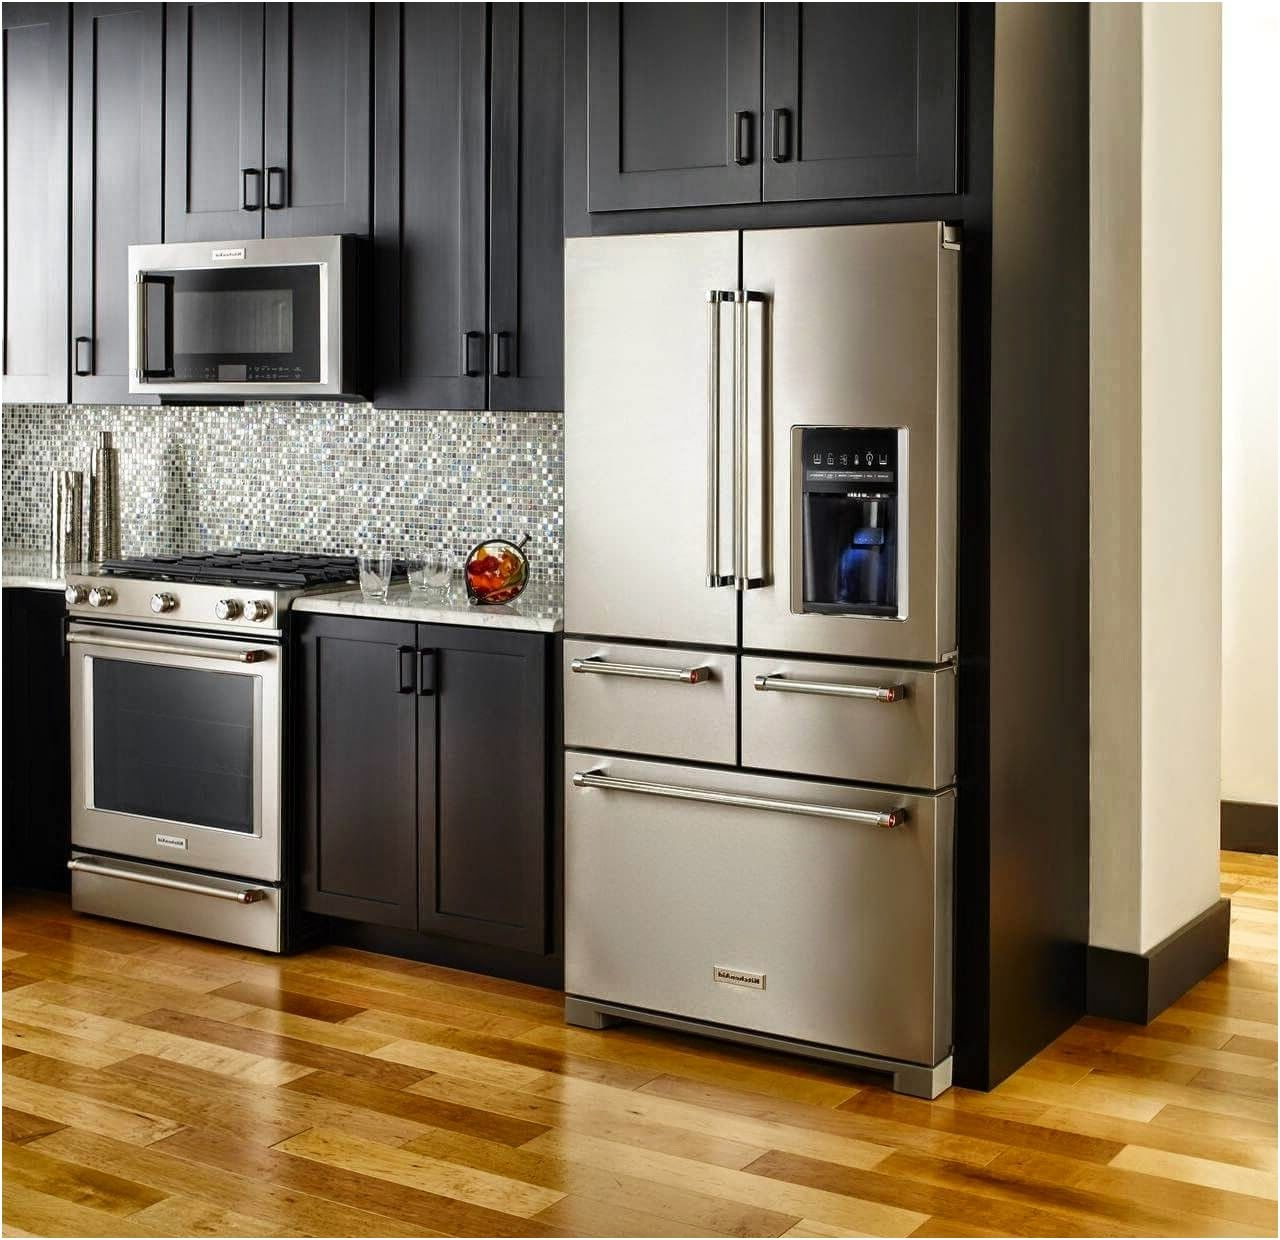 Fine Kitchenaid Appliance Bundle Home Depot Kitchen Package Deals